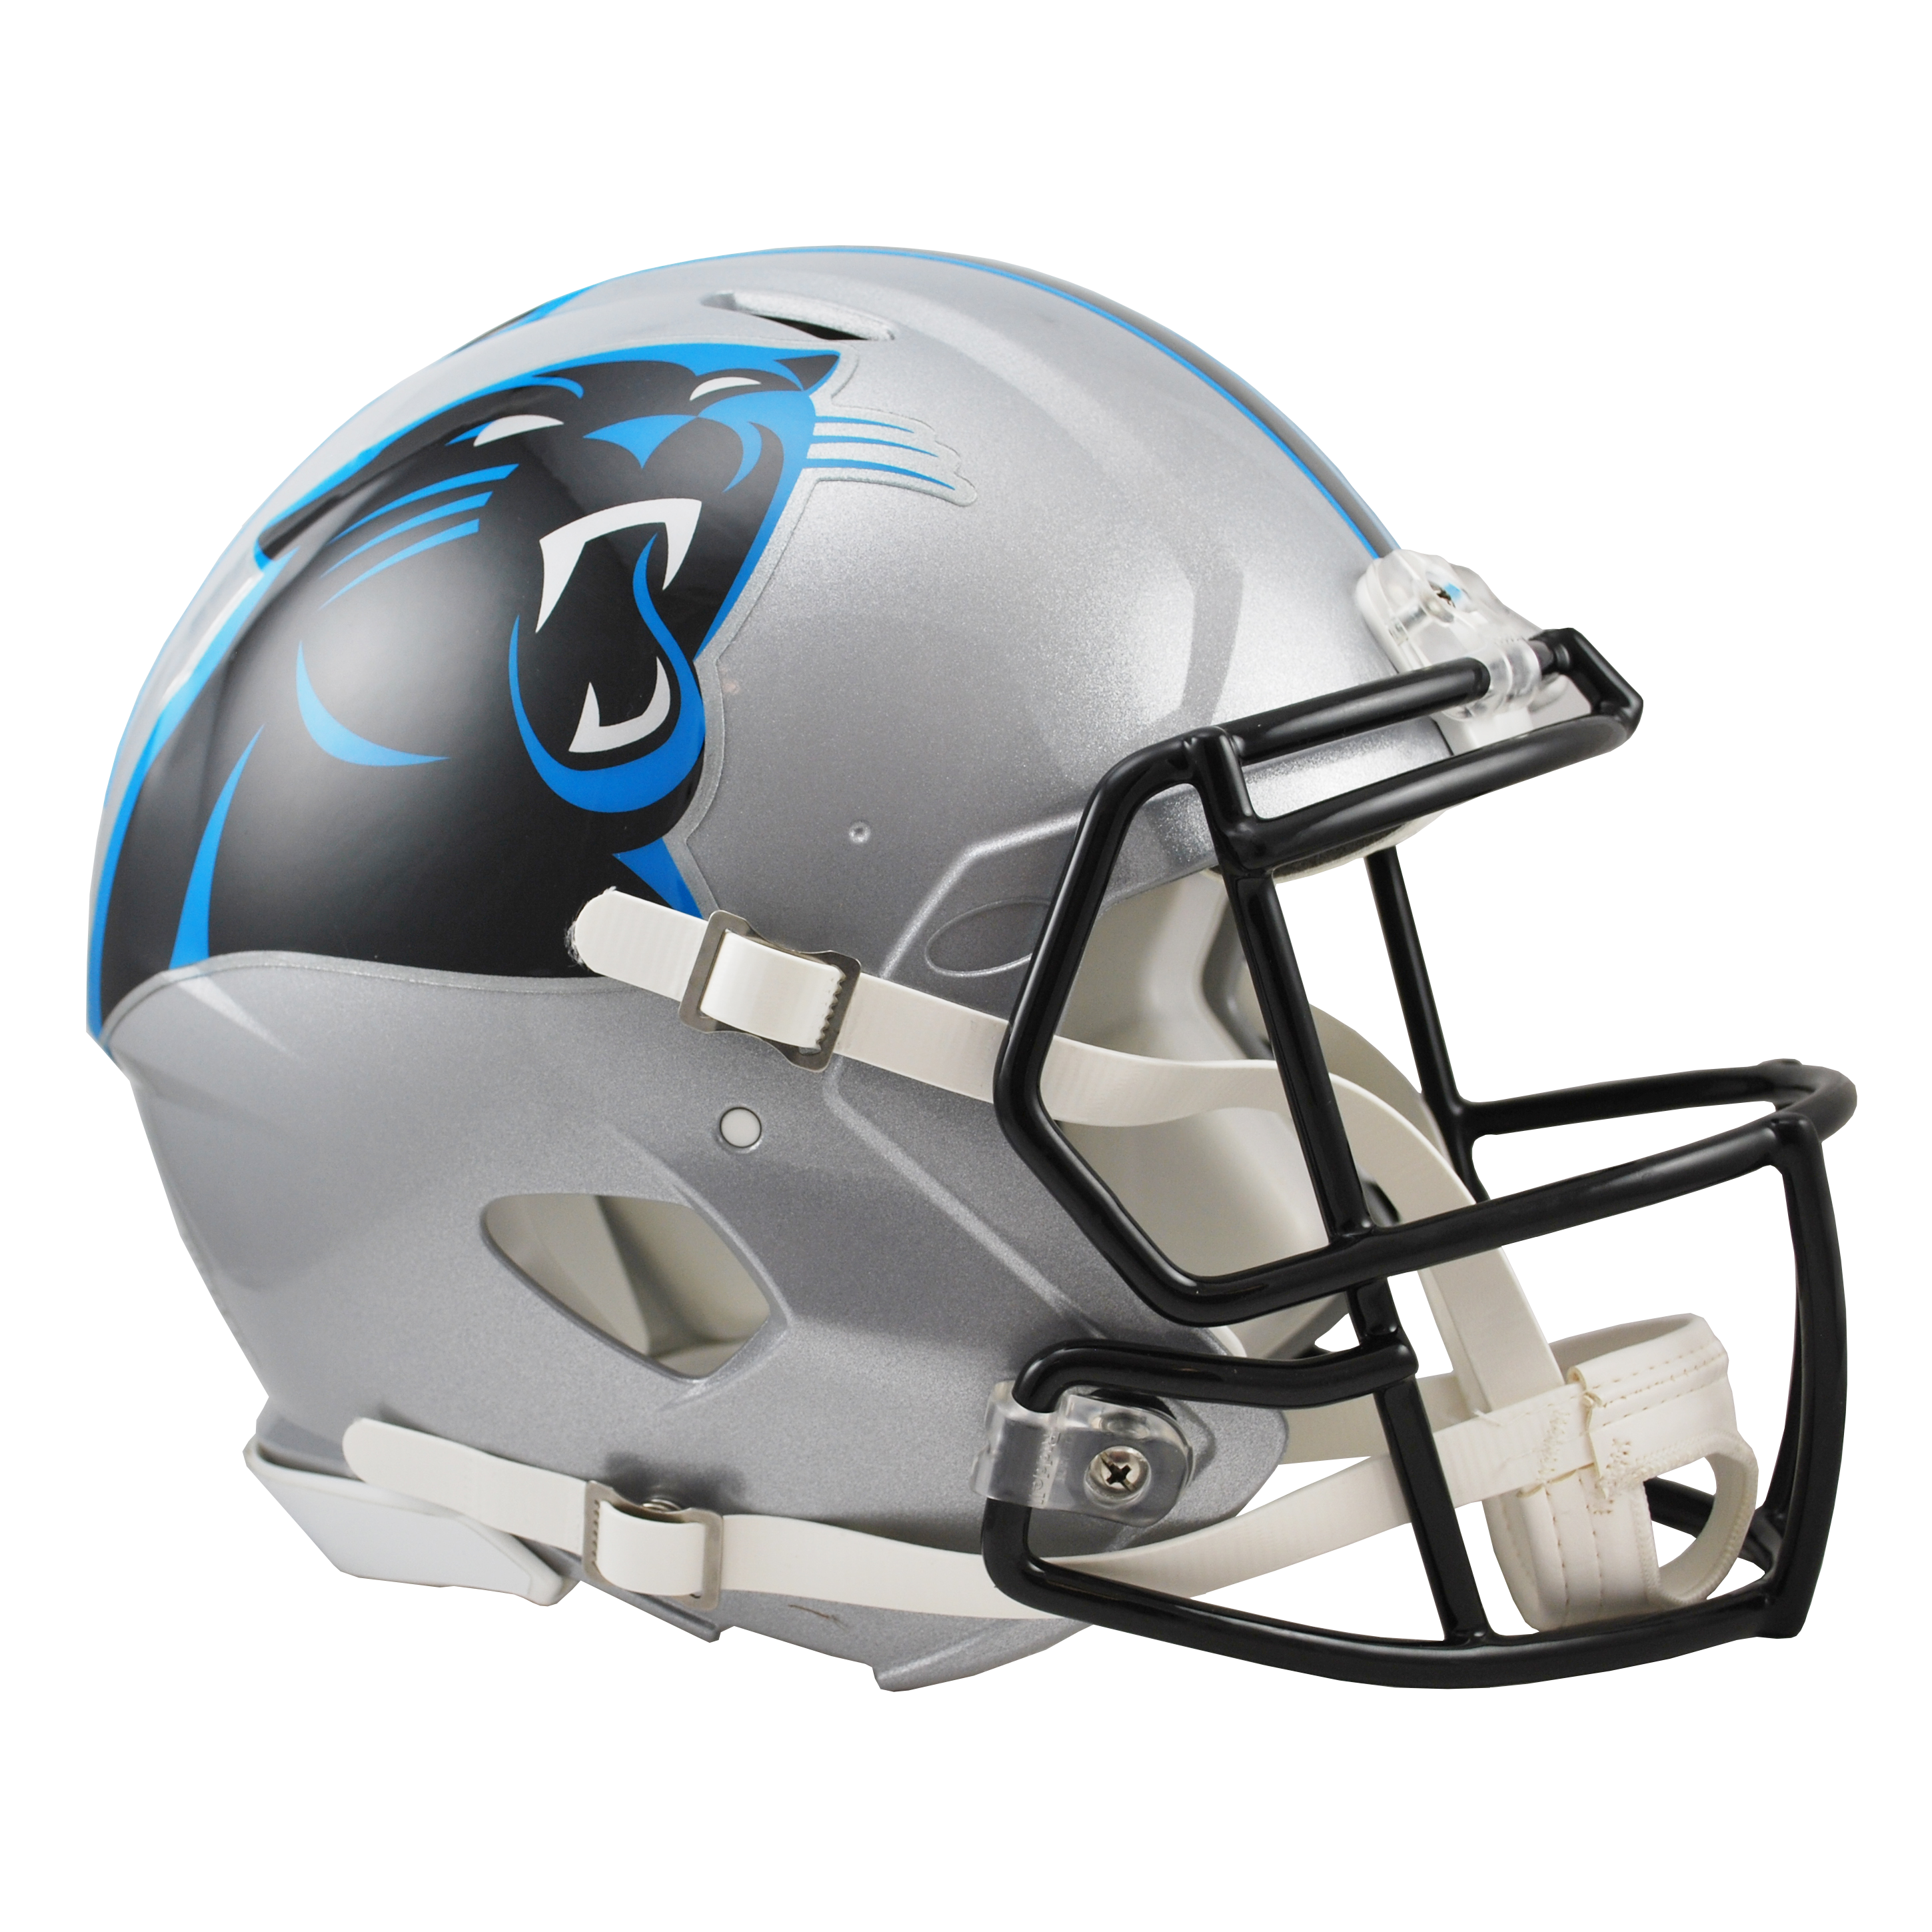 Panthers helmet png. Carolina revolution speed authentic